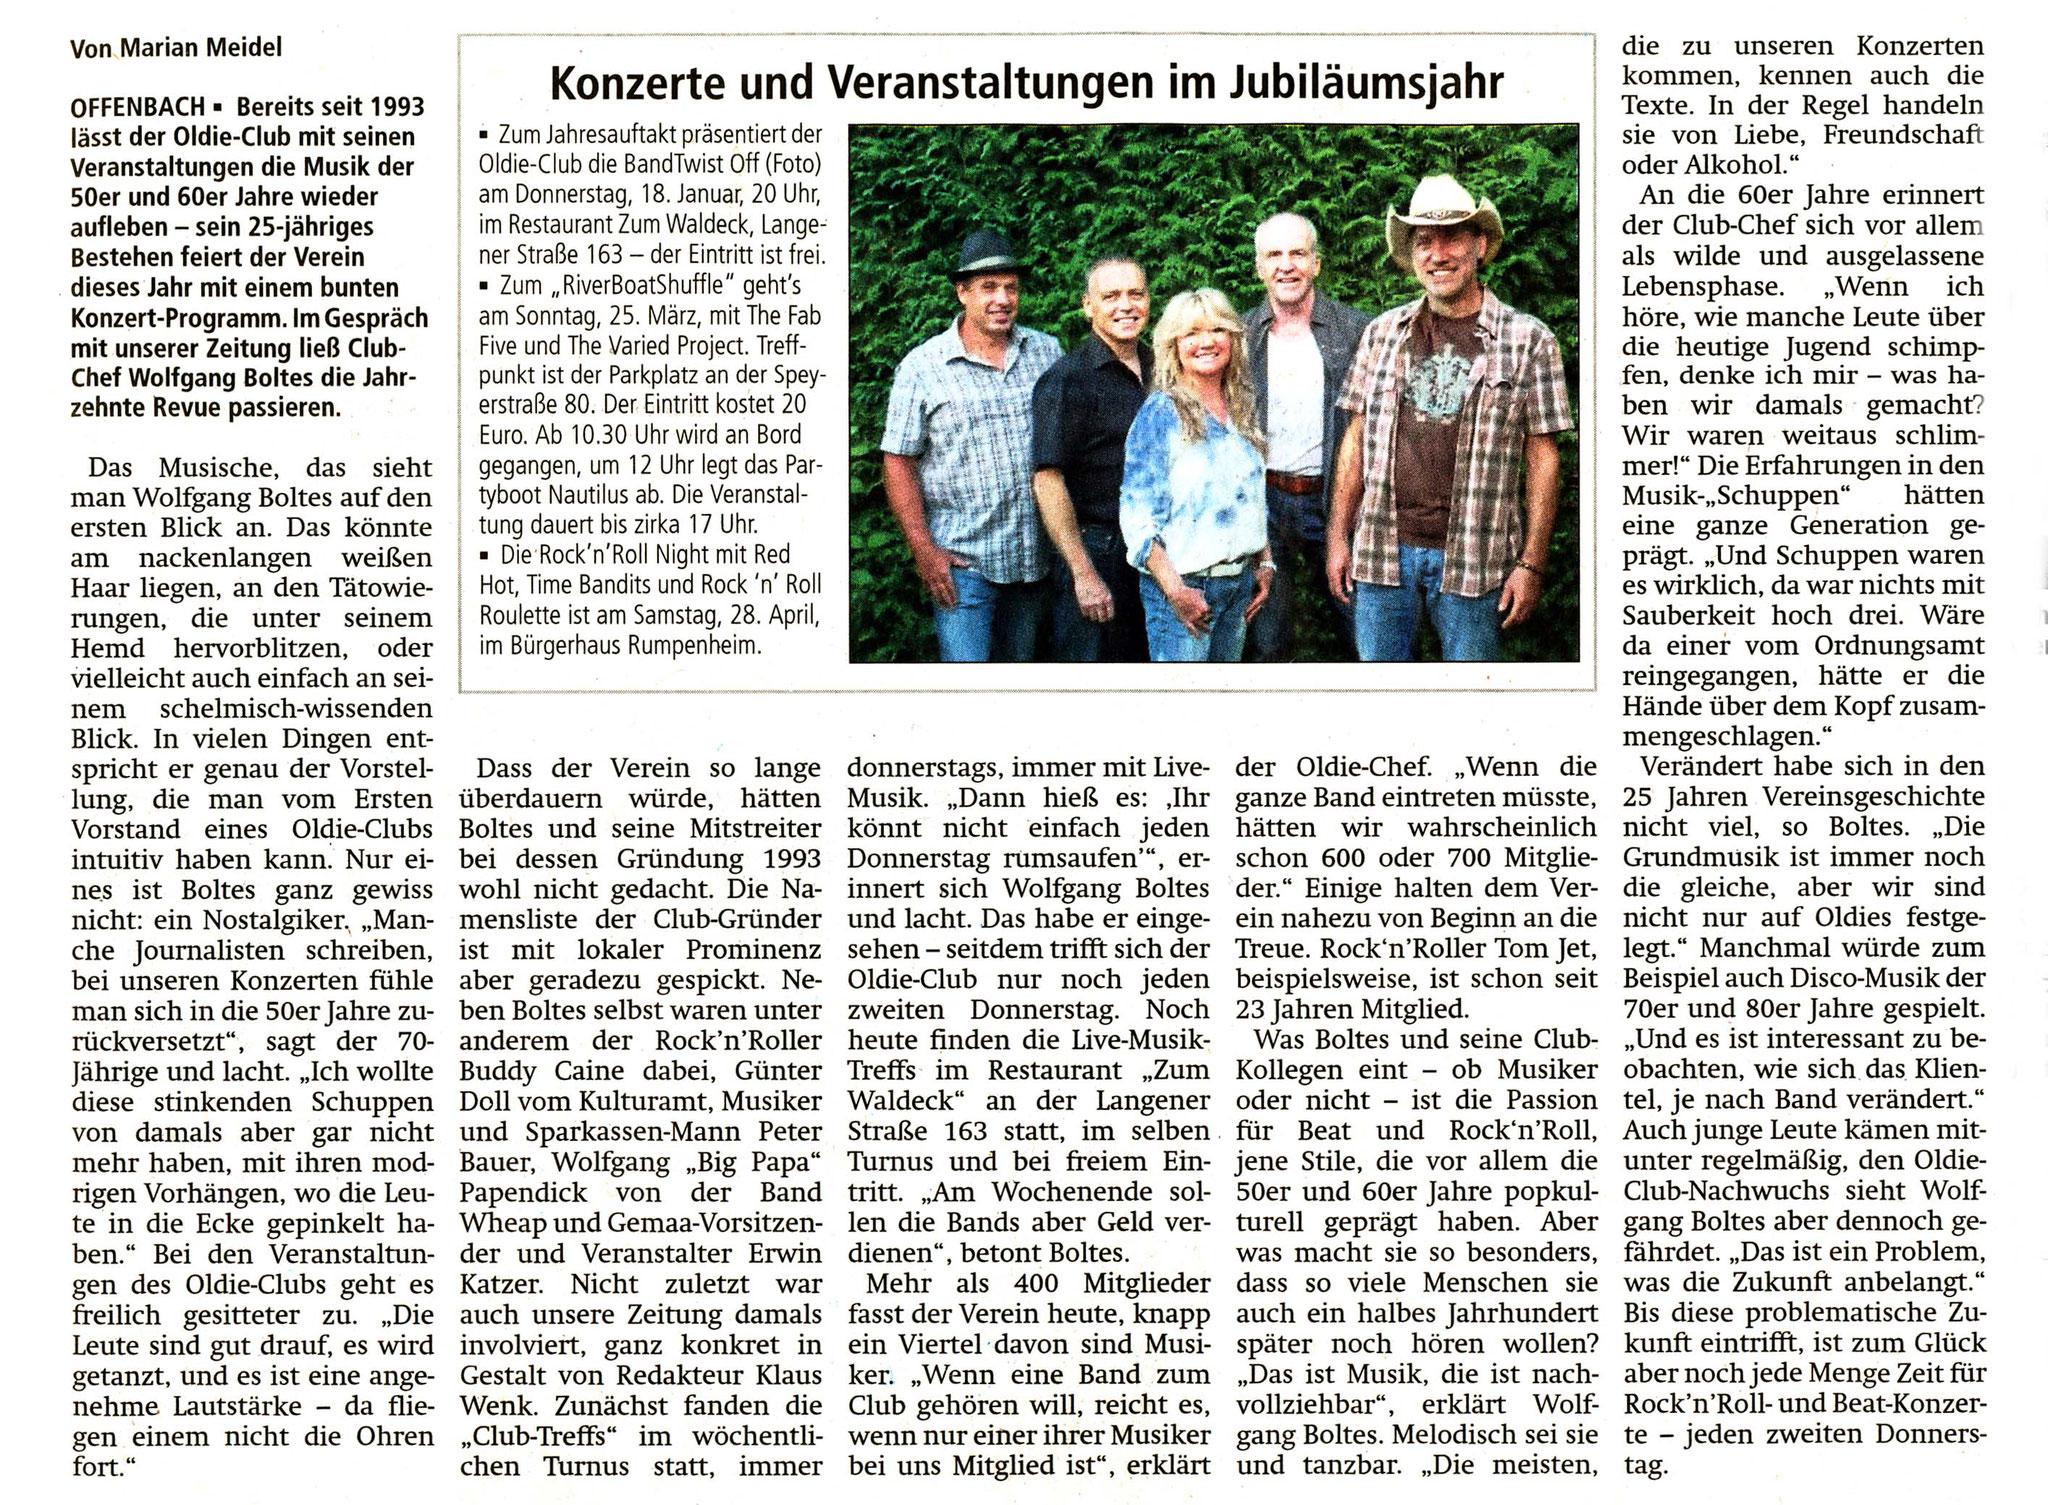 Offenbach Post, 13. Januar 2018 (2)